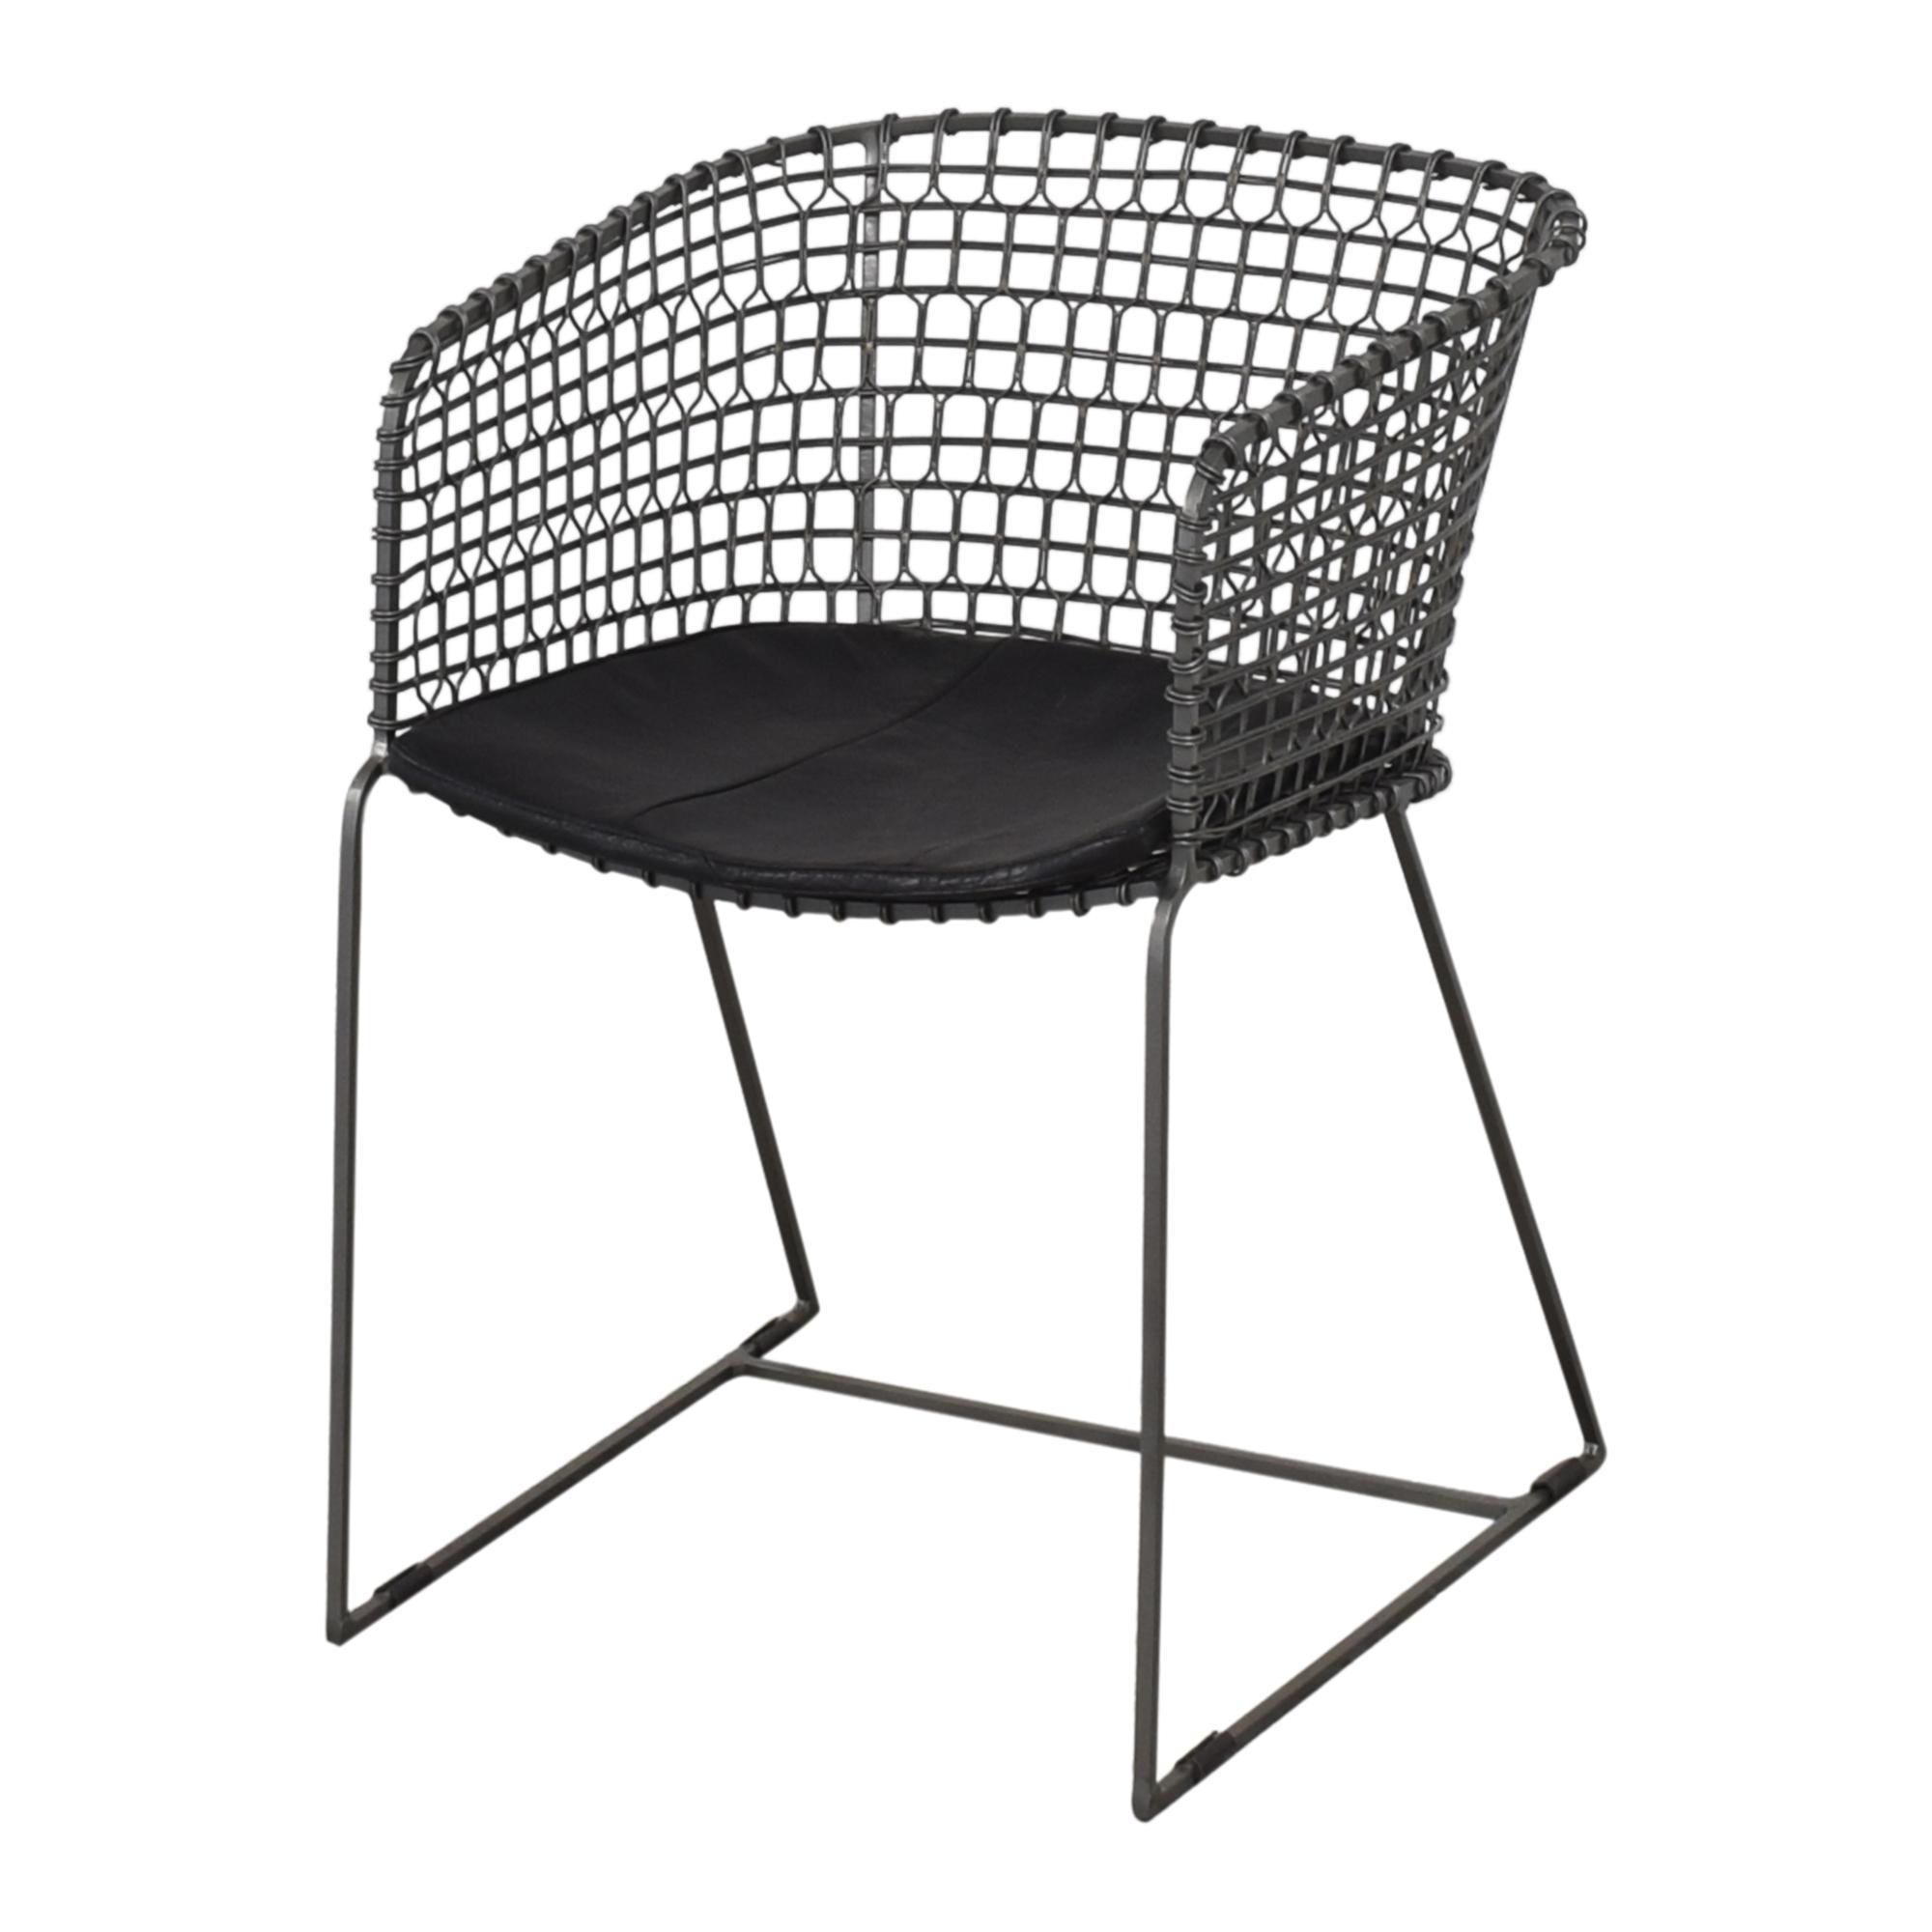 Crate & Barrel Tig Barrel Dining Chairs sale